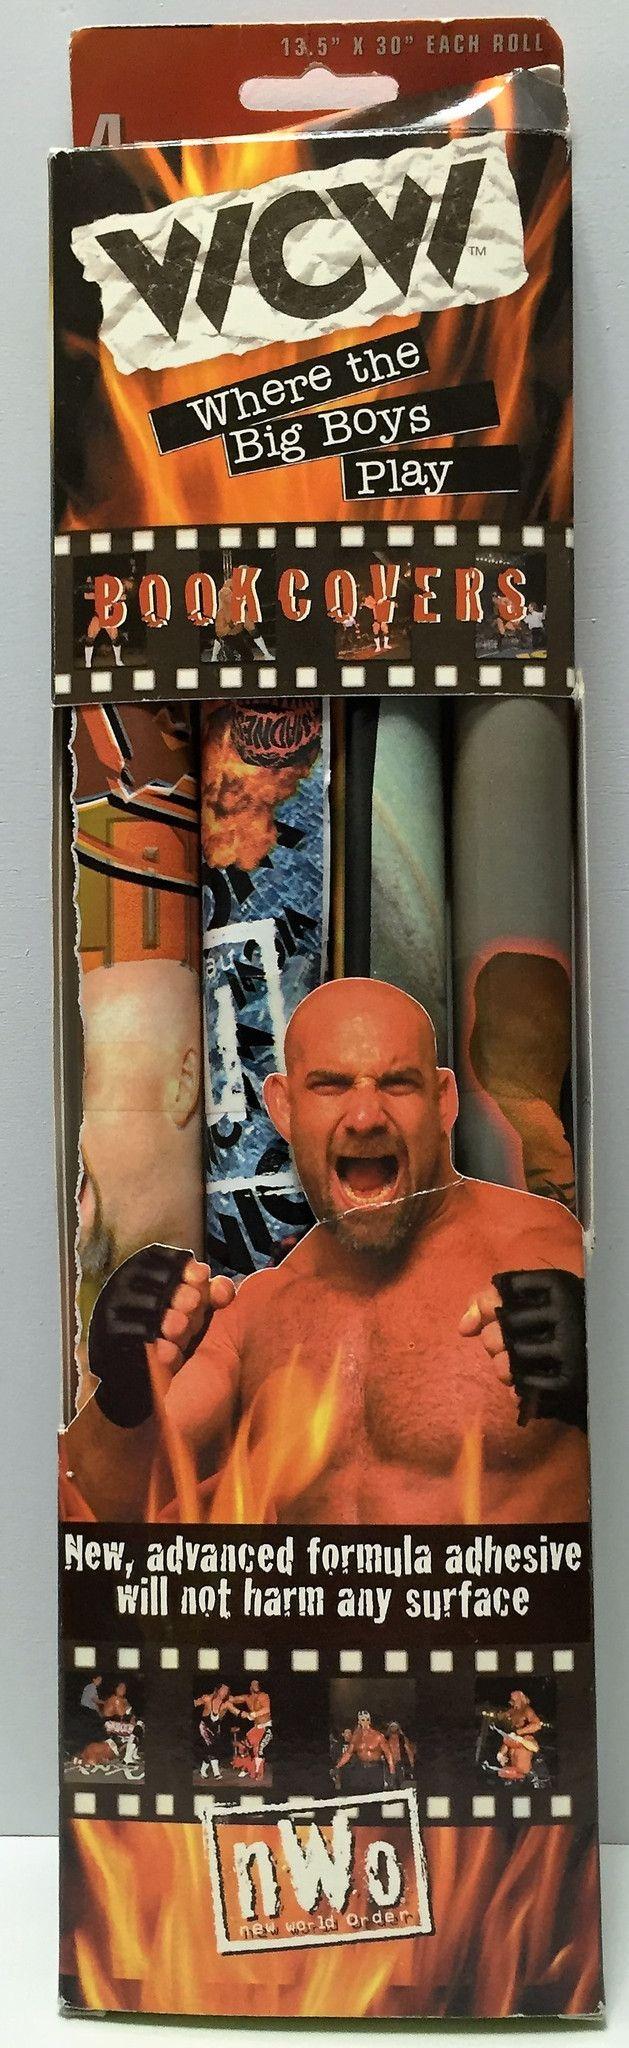 (TAS034929) - 1999 Kittrich Corporation WCW nWo Wrestling Book Covers - Goldberg